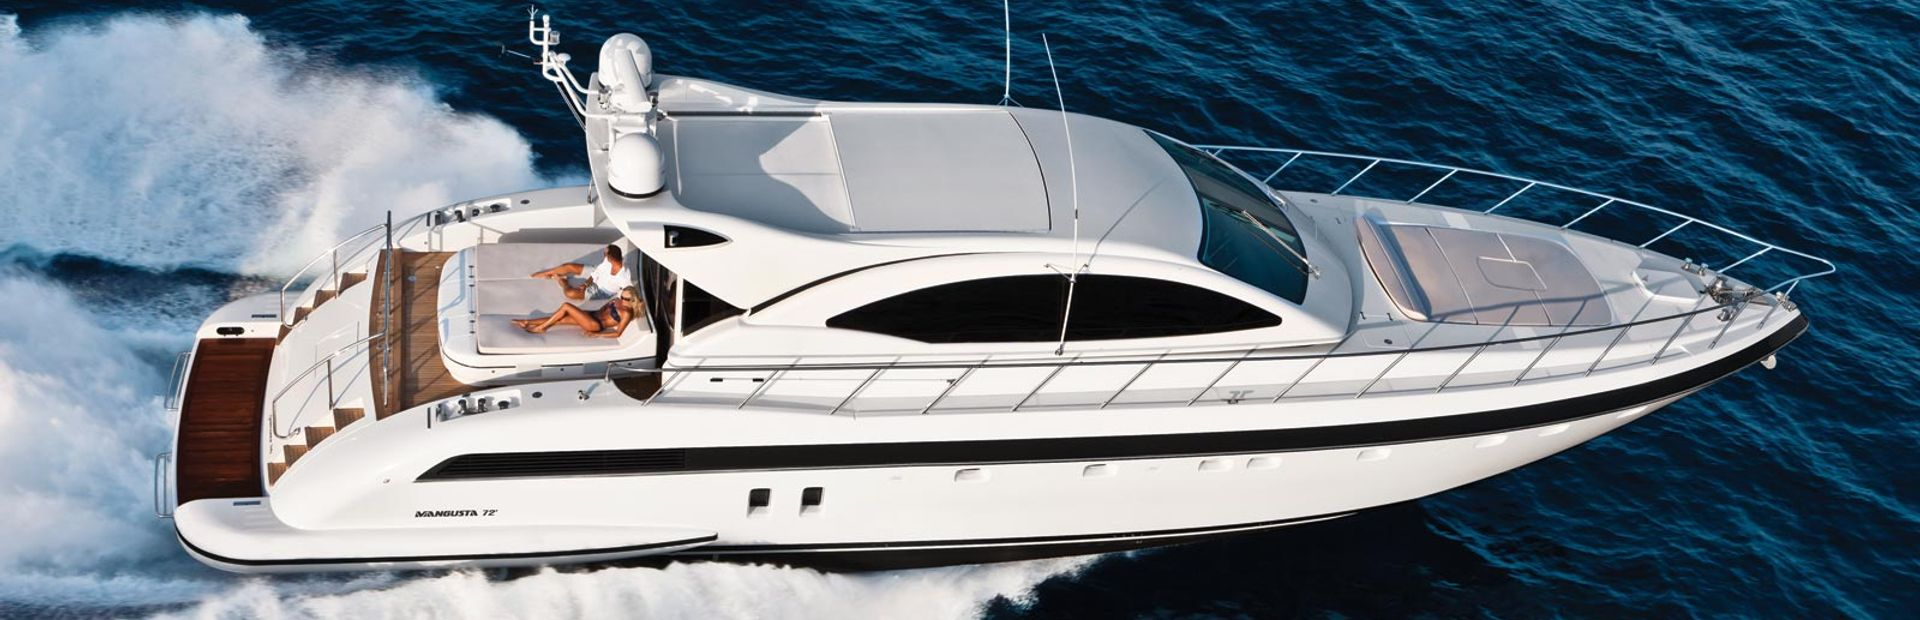 Mangusta 72 Yacht Charter